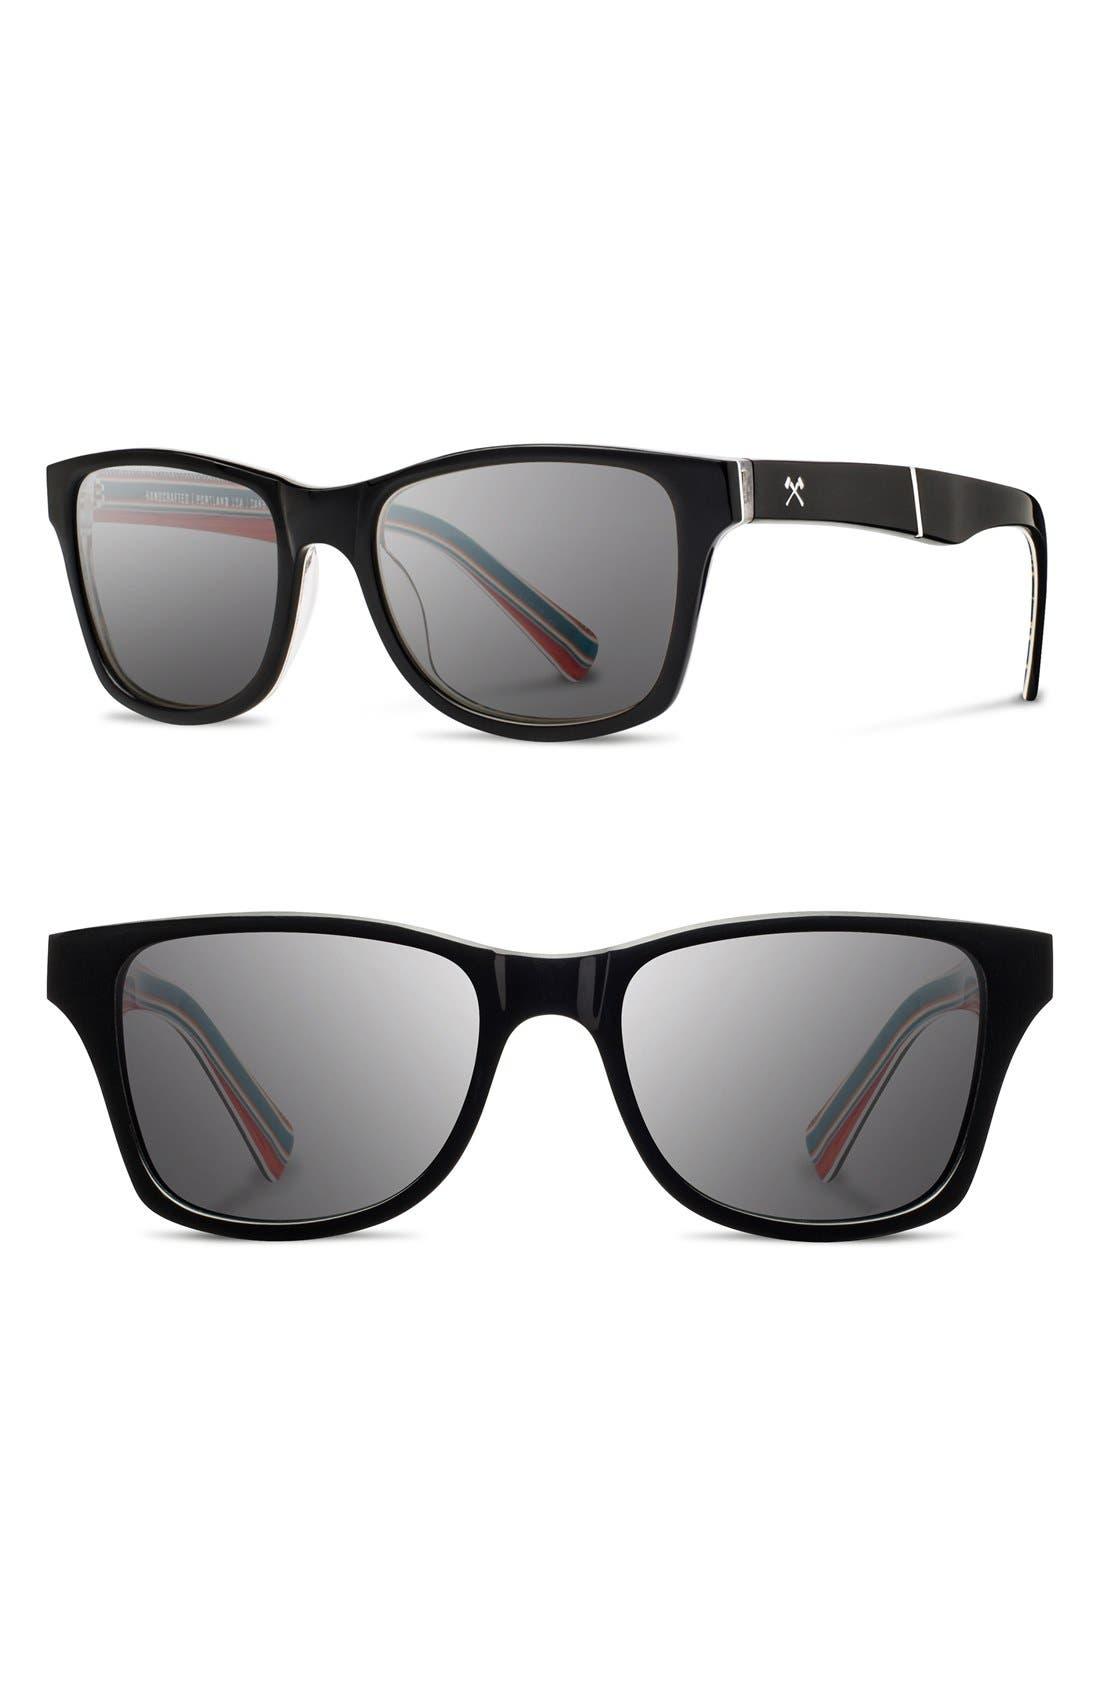 'Canby - Pendleton' 54mm Polarized Sunglasses,                         Main,                         color, Black/ Turquoise Serape/ Grey